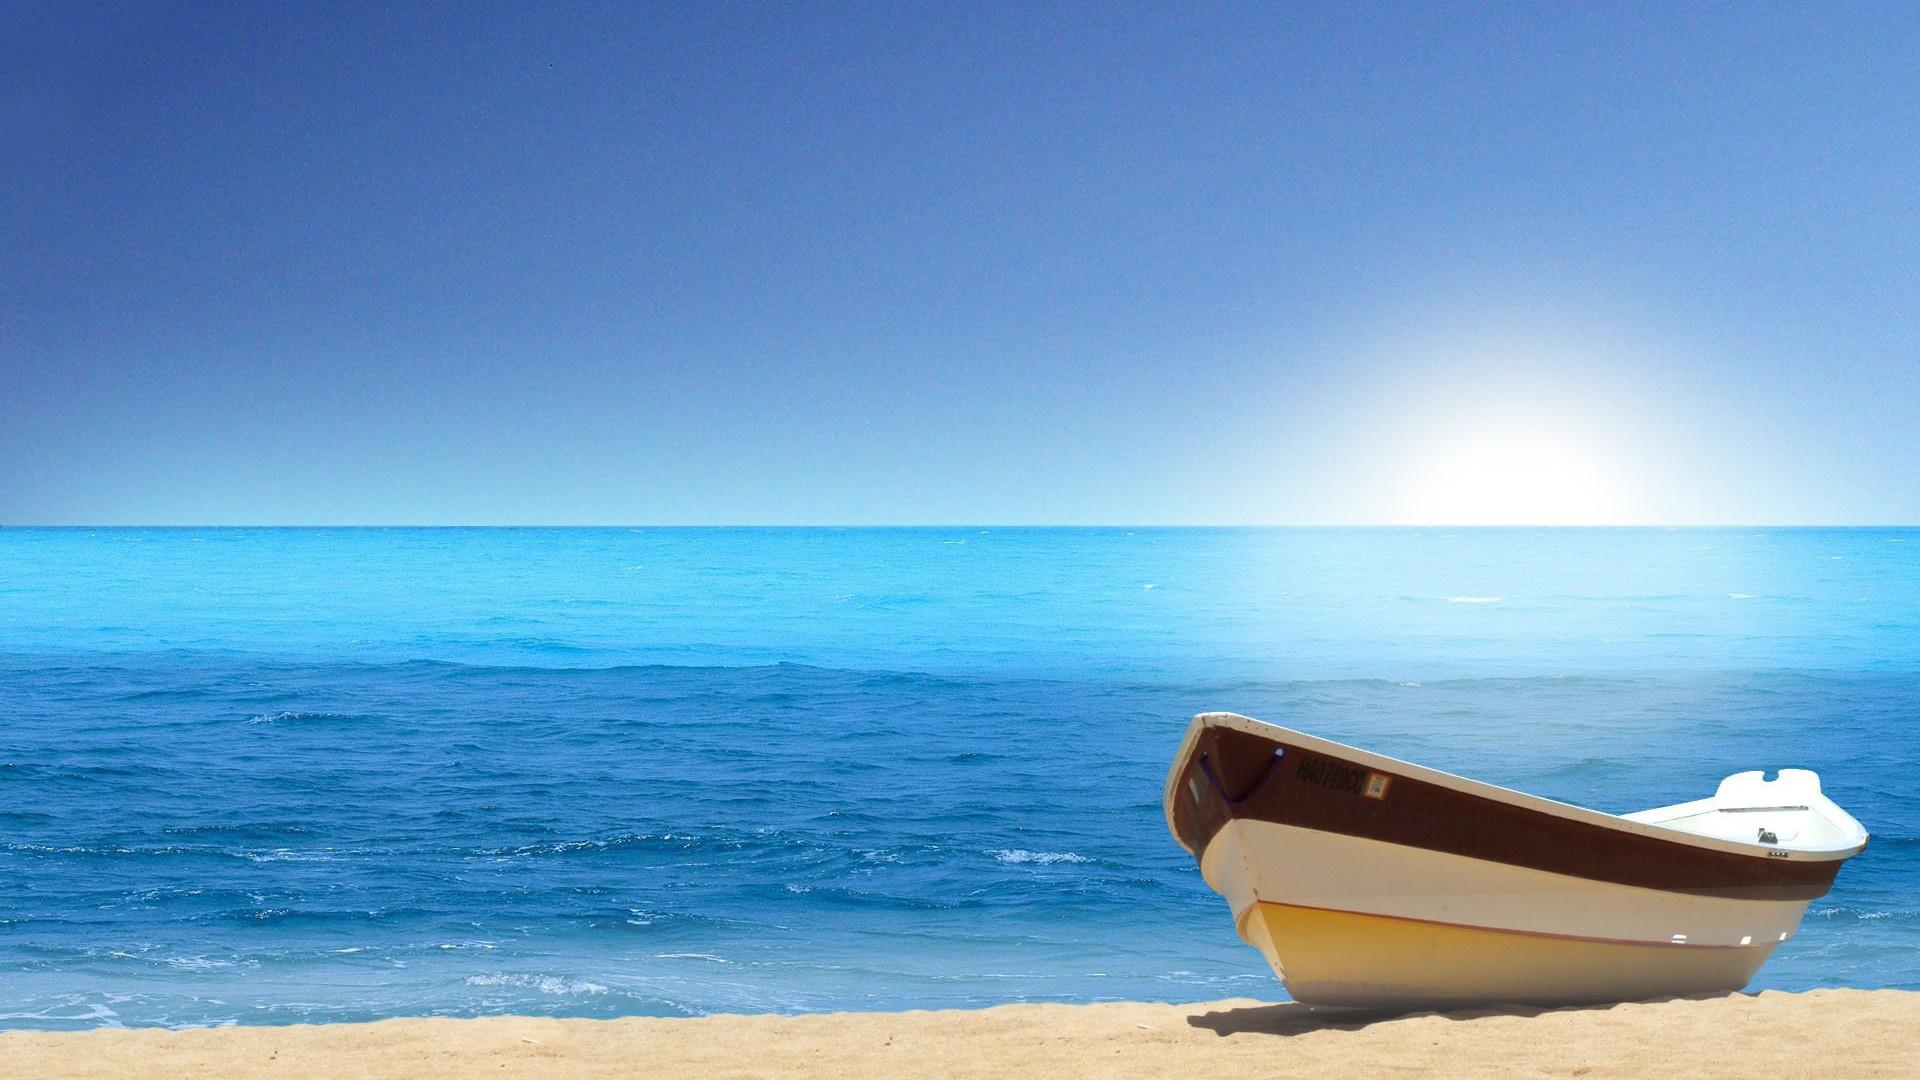 Ocean 1080p 1920x1080